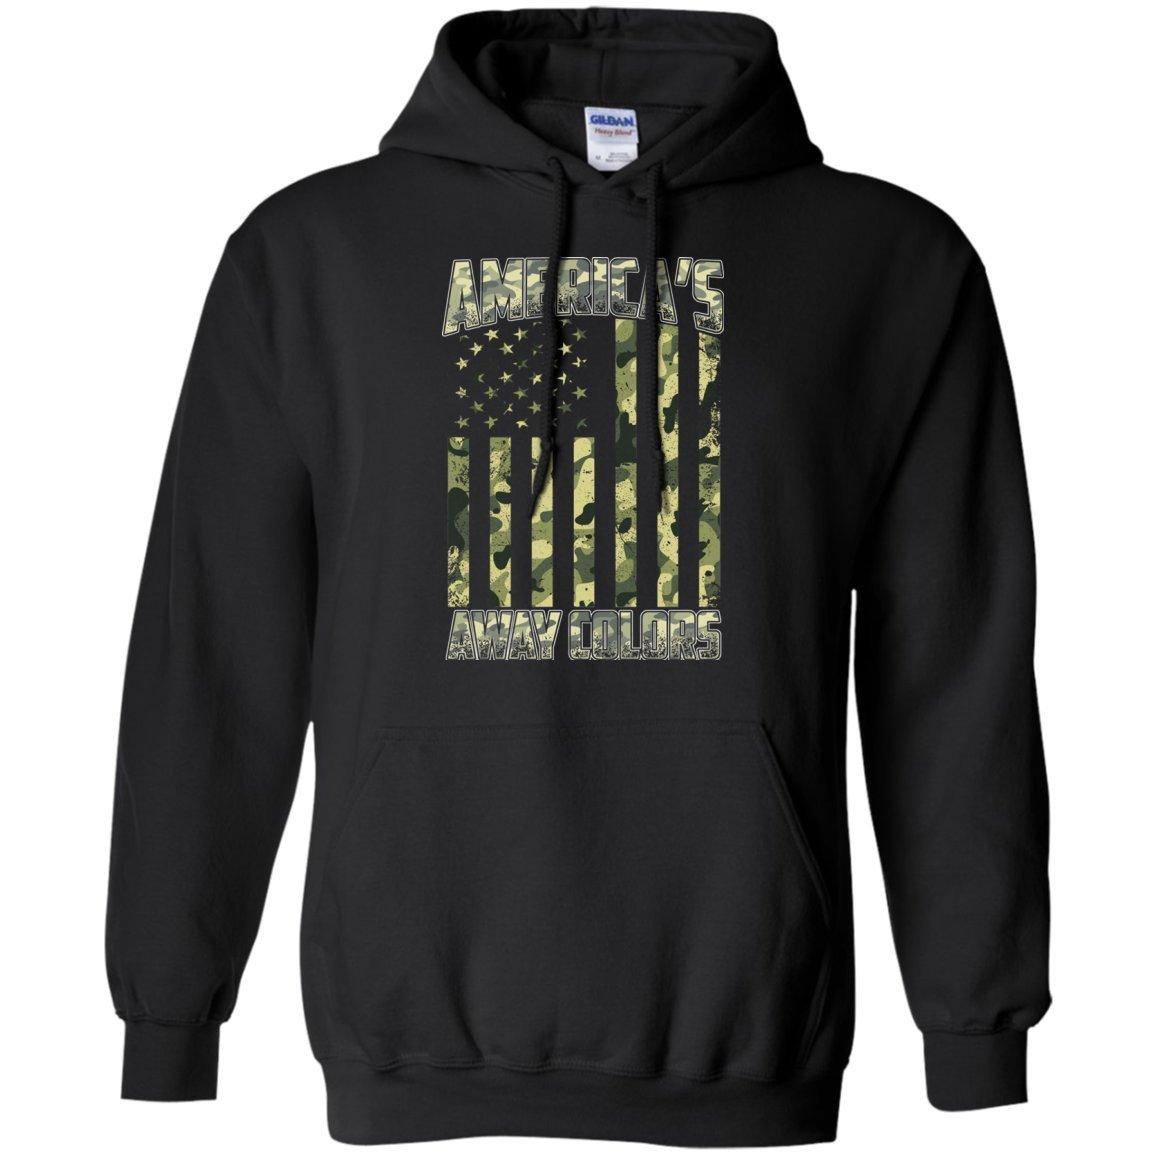 America mybirthday.shop Americas Away Colors